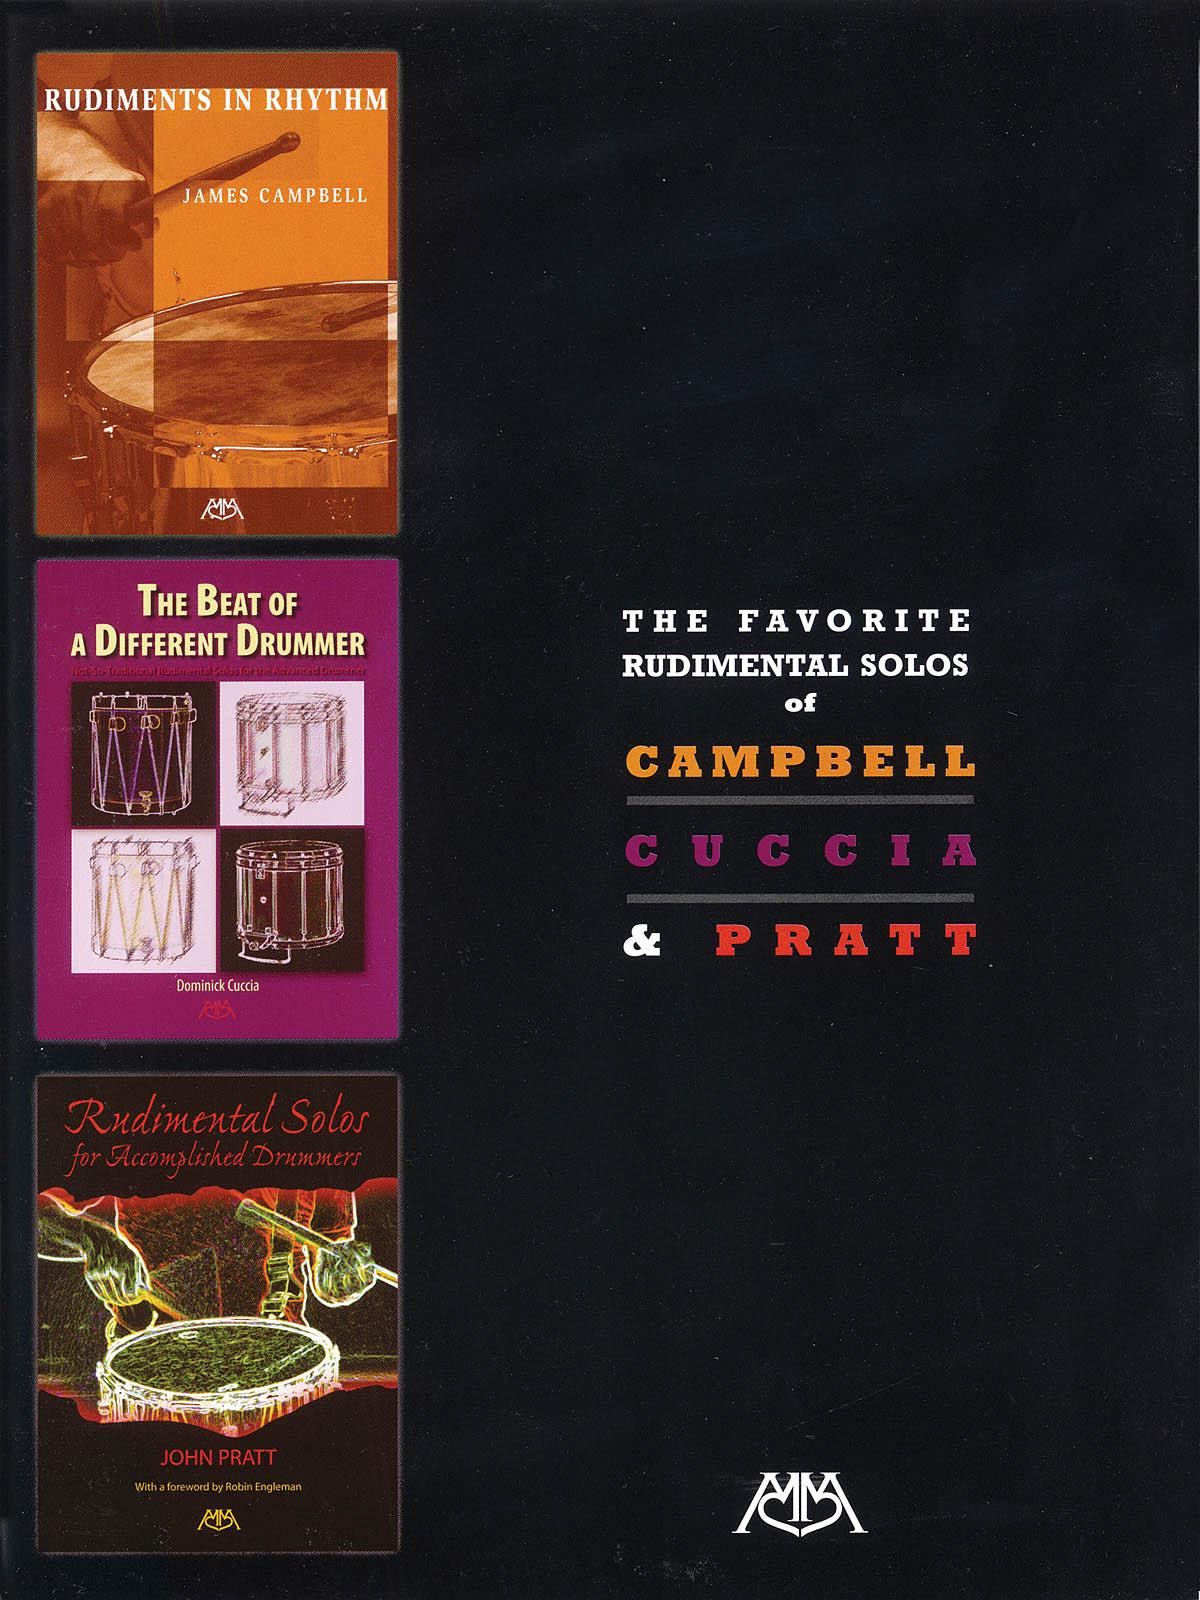 Dominick Cuccia James Campbell John Pratt: The Favorite Rudimental Solos of